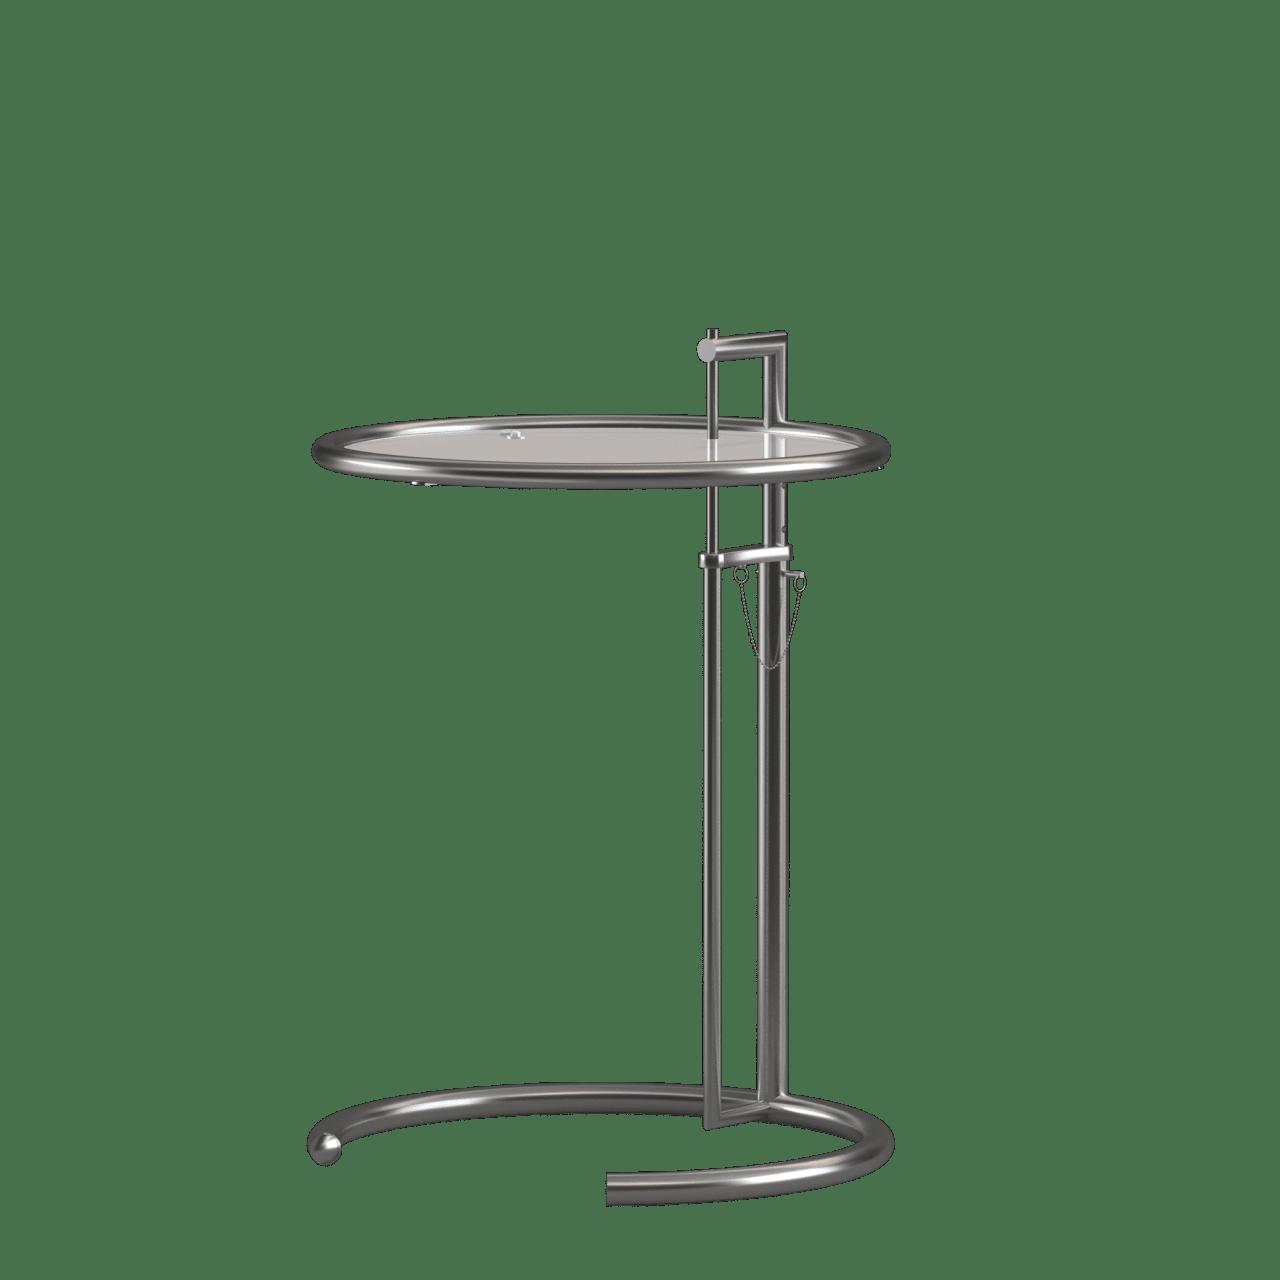 Adjustable Table Beistelltsich